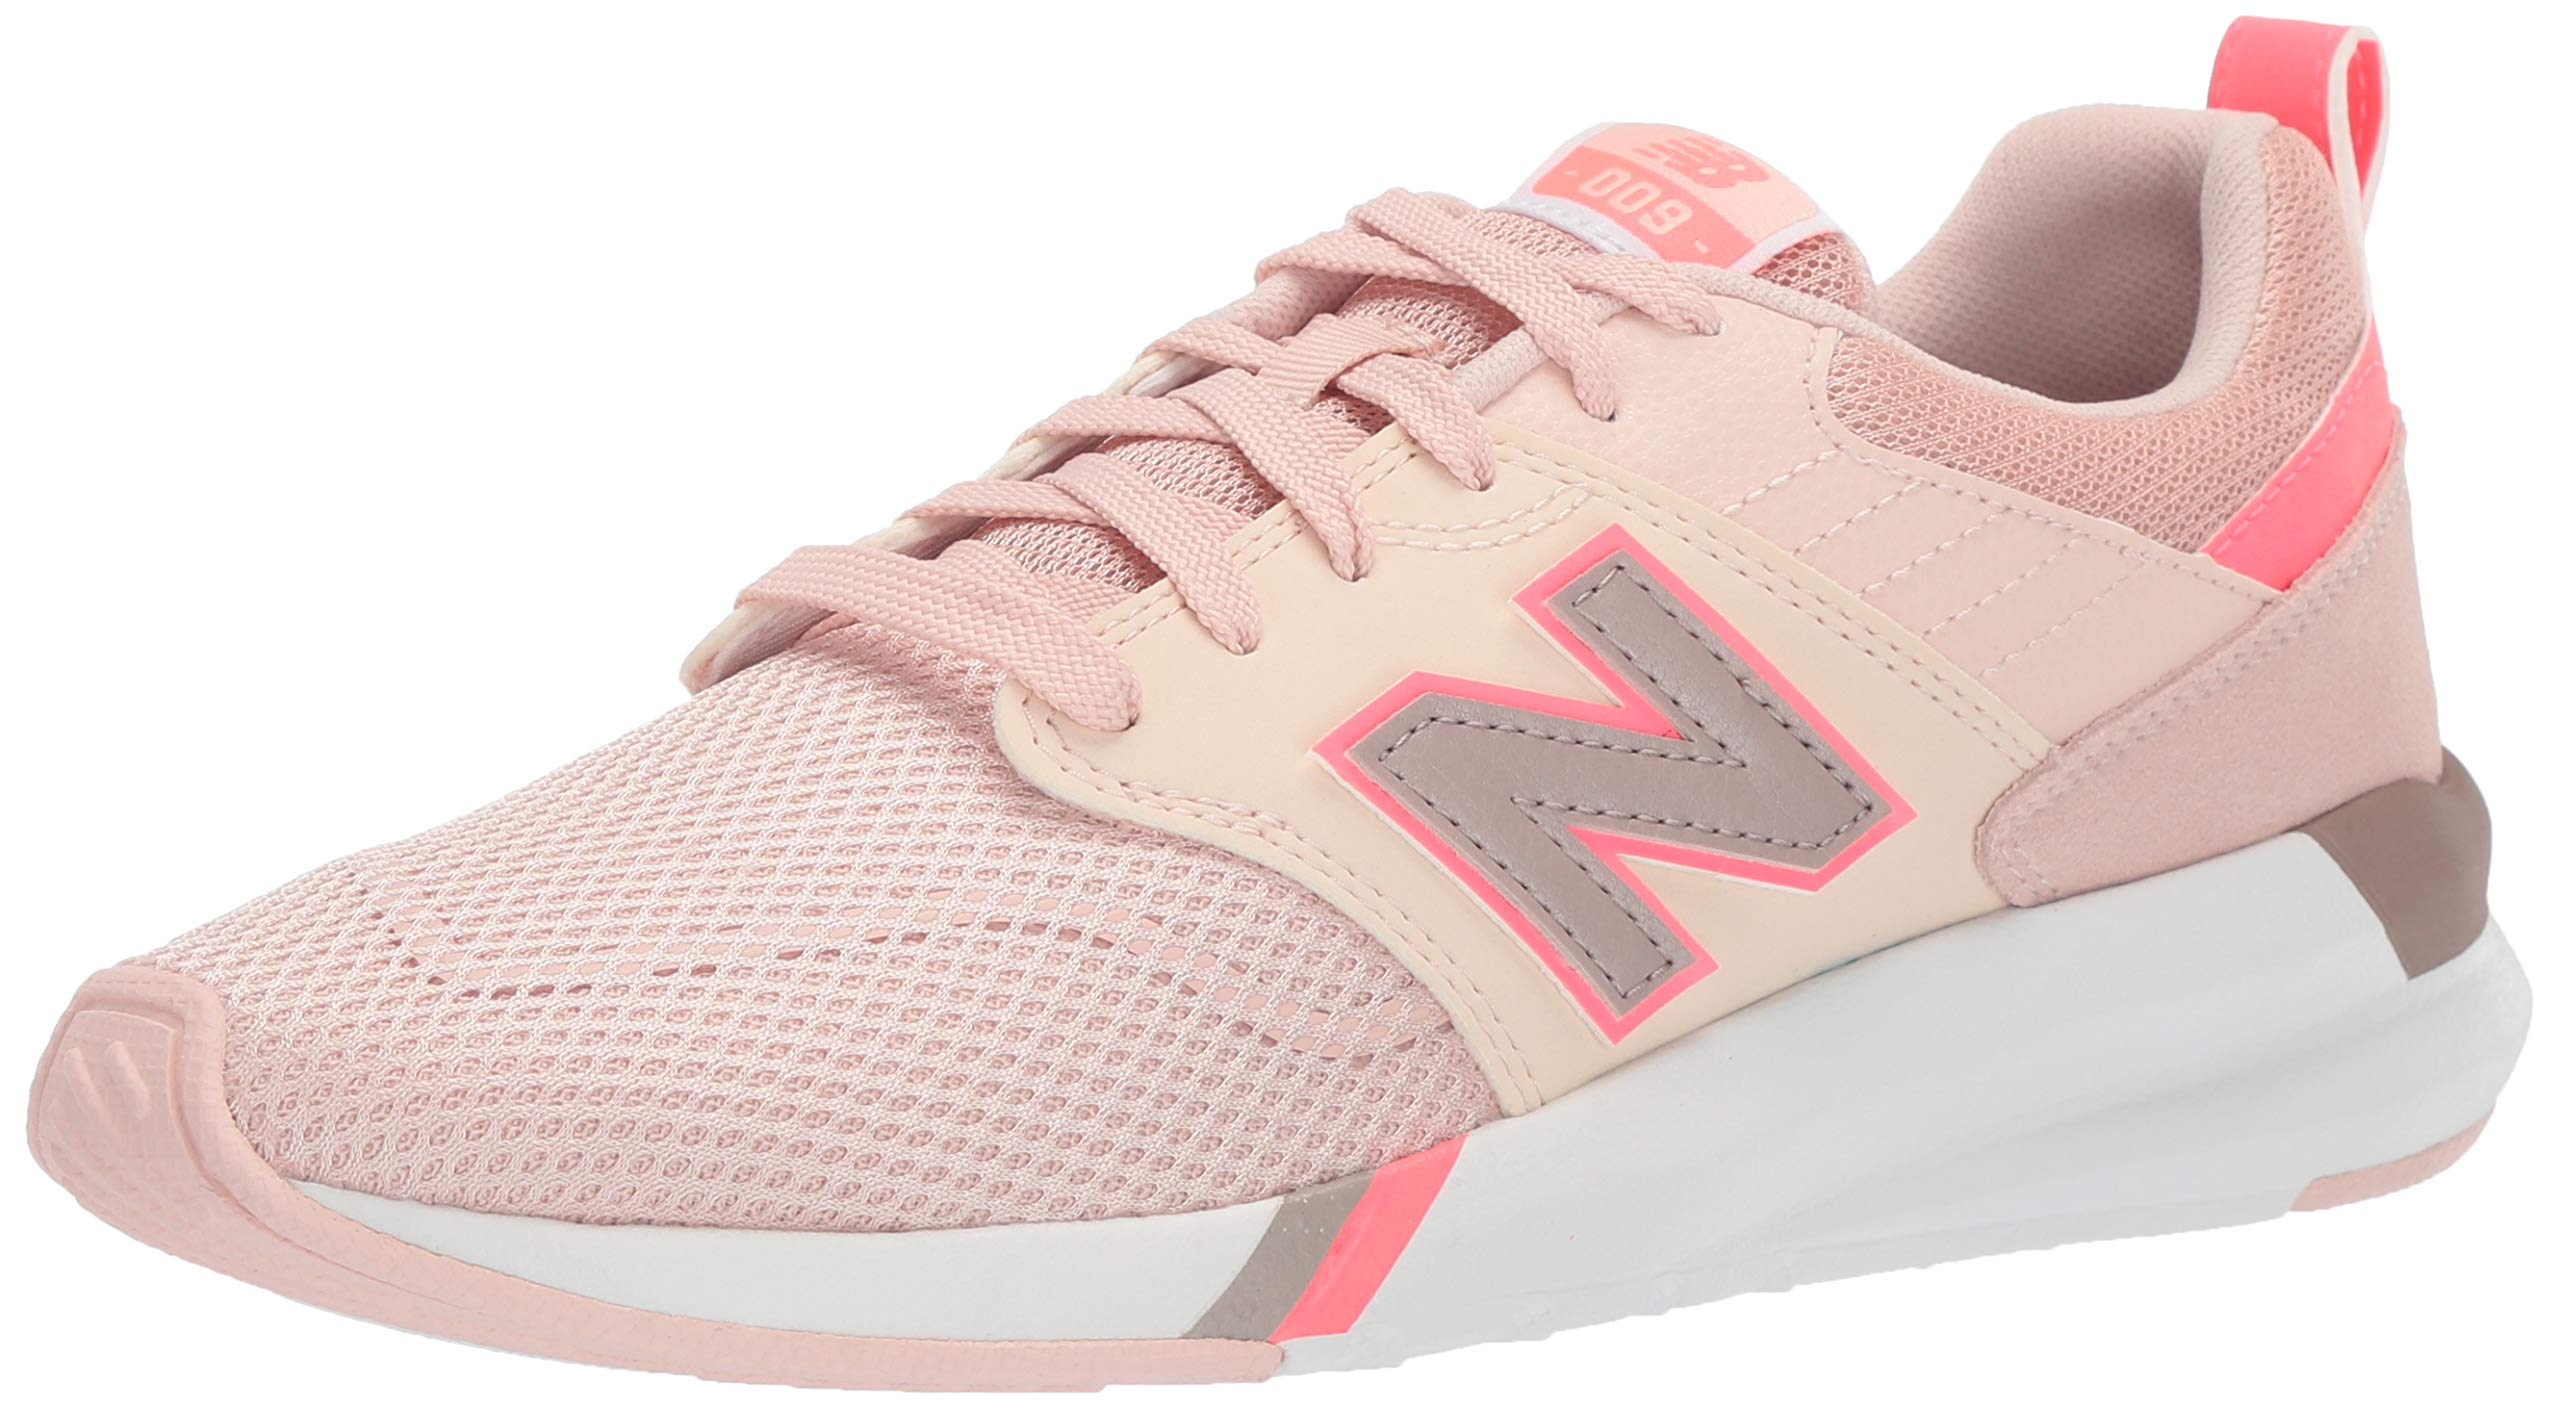 New Balance Women's 009 V1 Sneaker, Pink, 5 W US